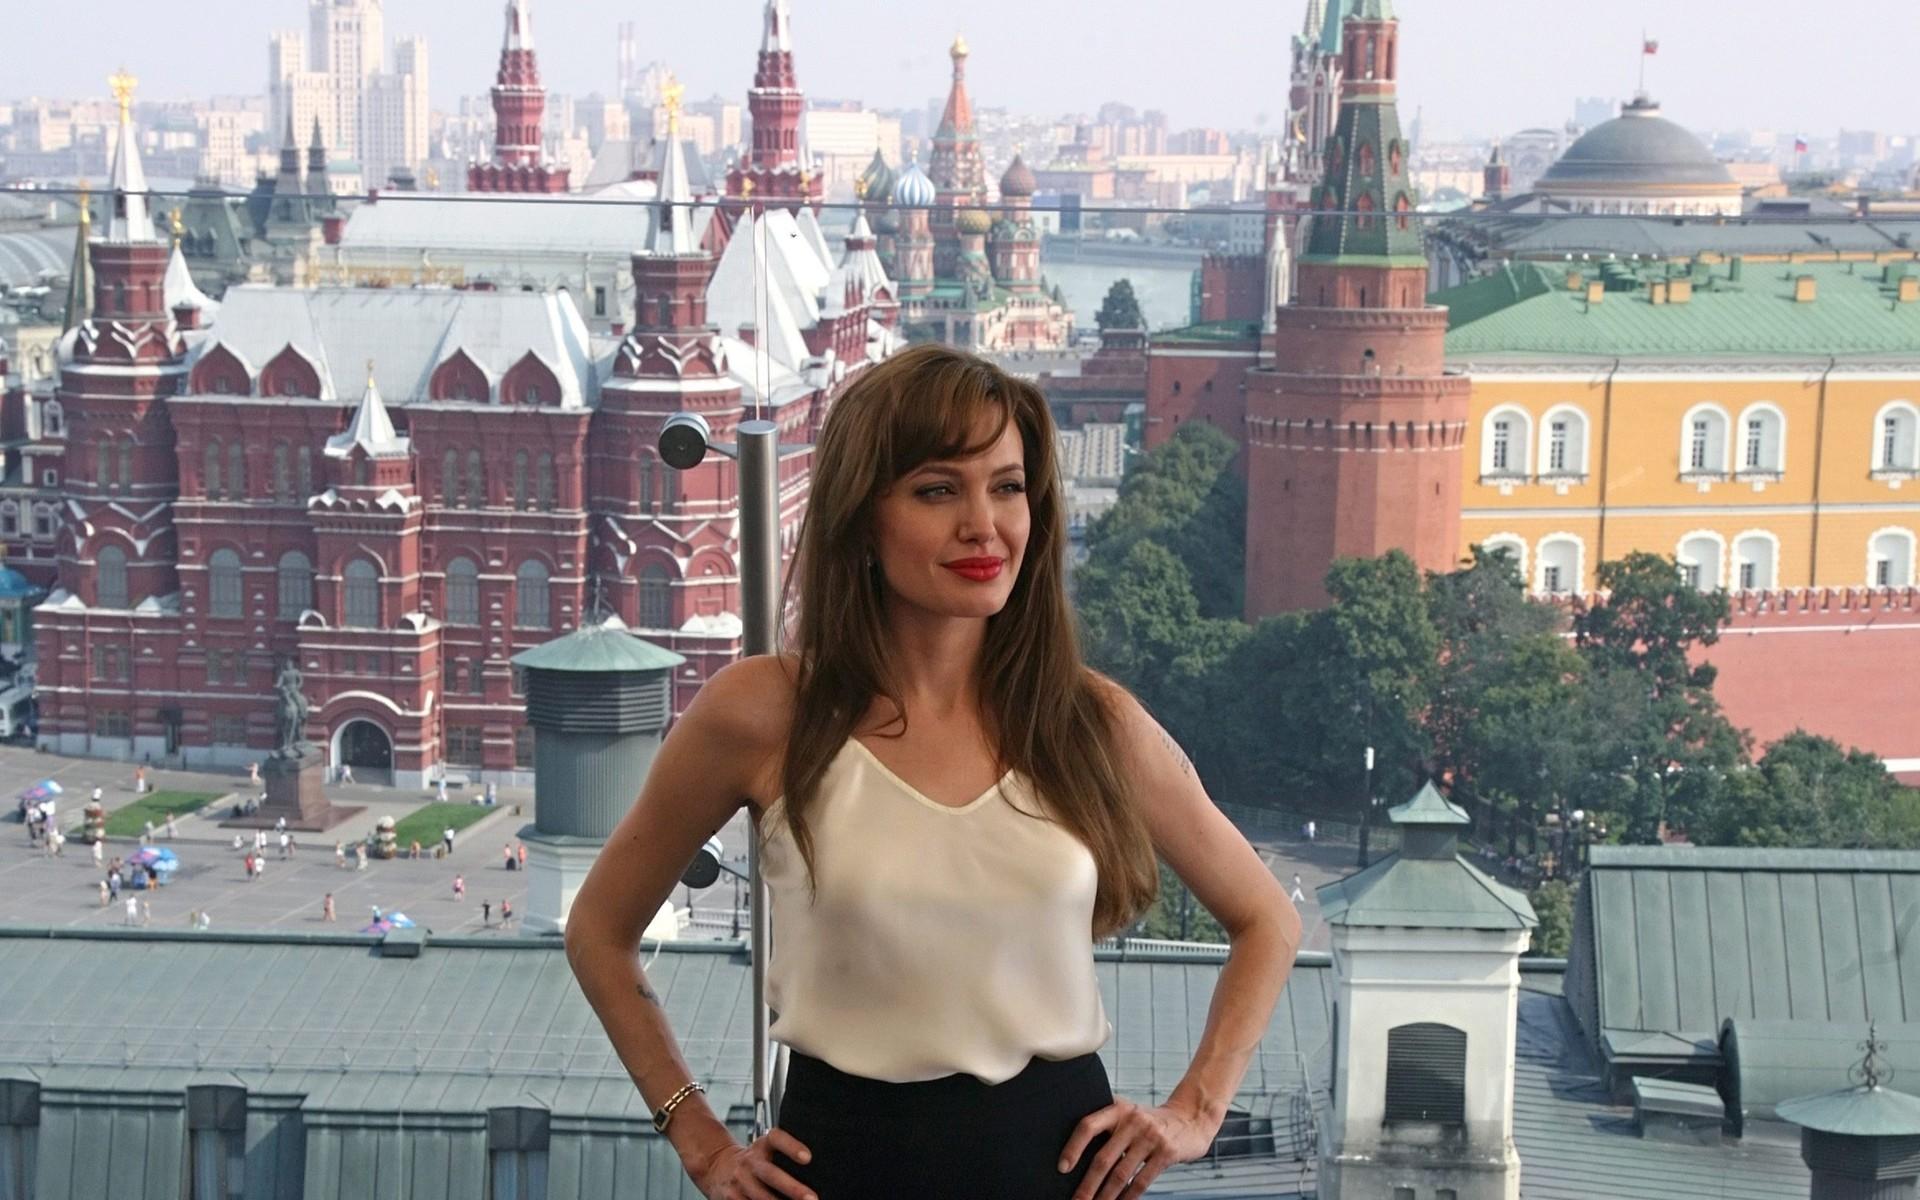 Анджелина Джоли в Москве обои, фото Angelina jolie картинки.